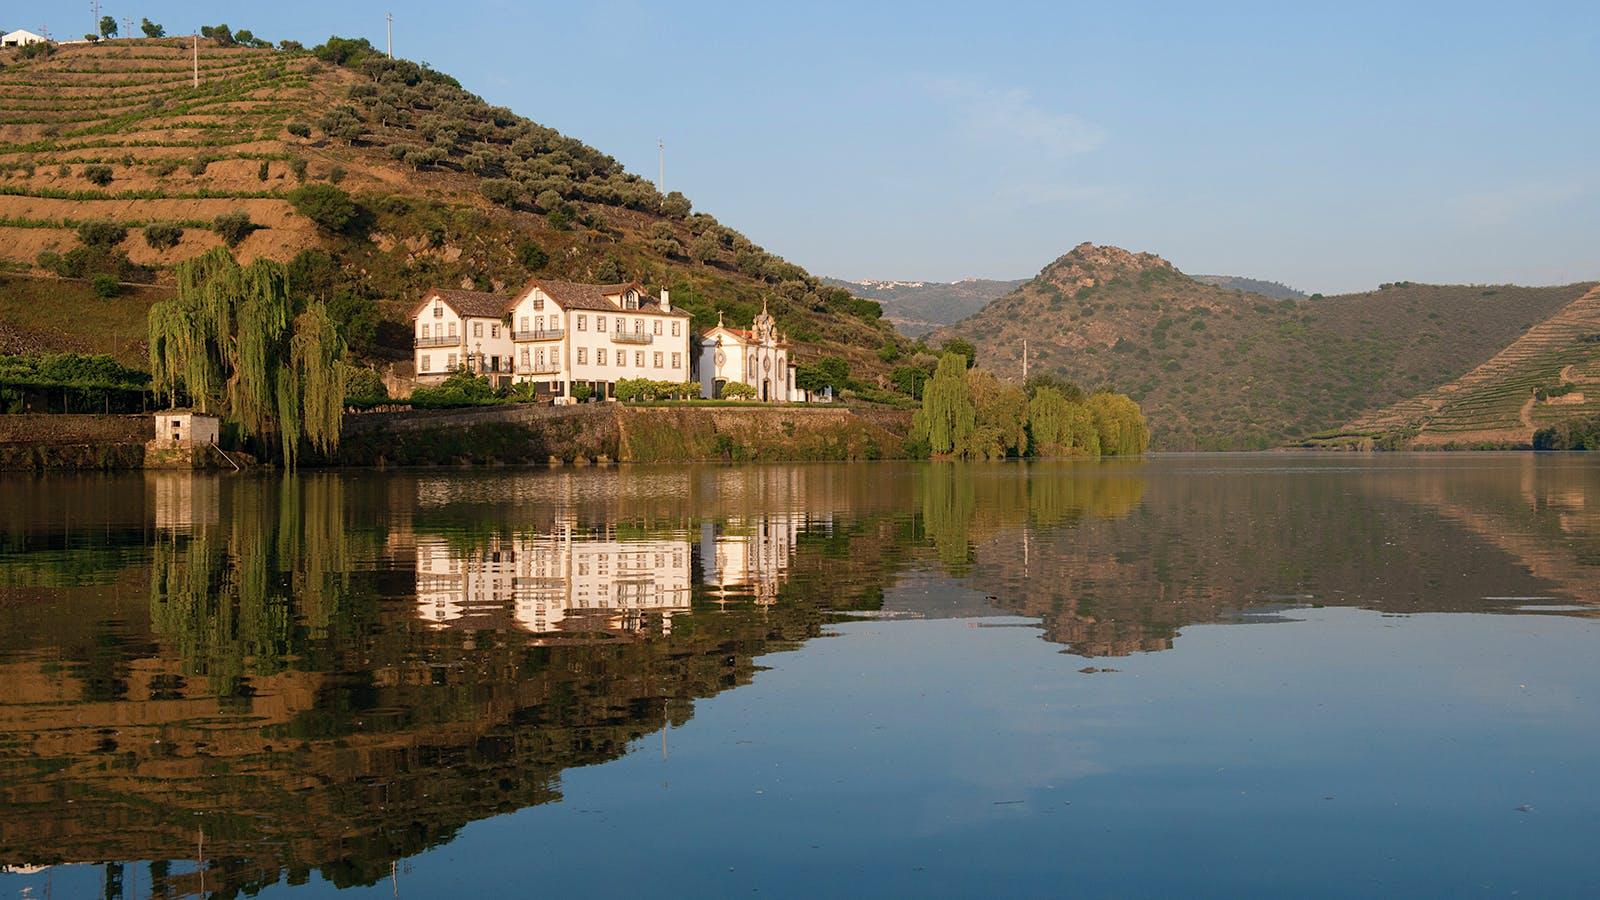 Consensus in the Douro: 2016 Vintage Port